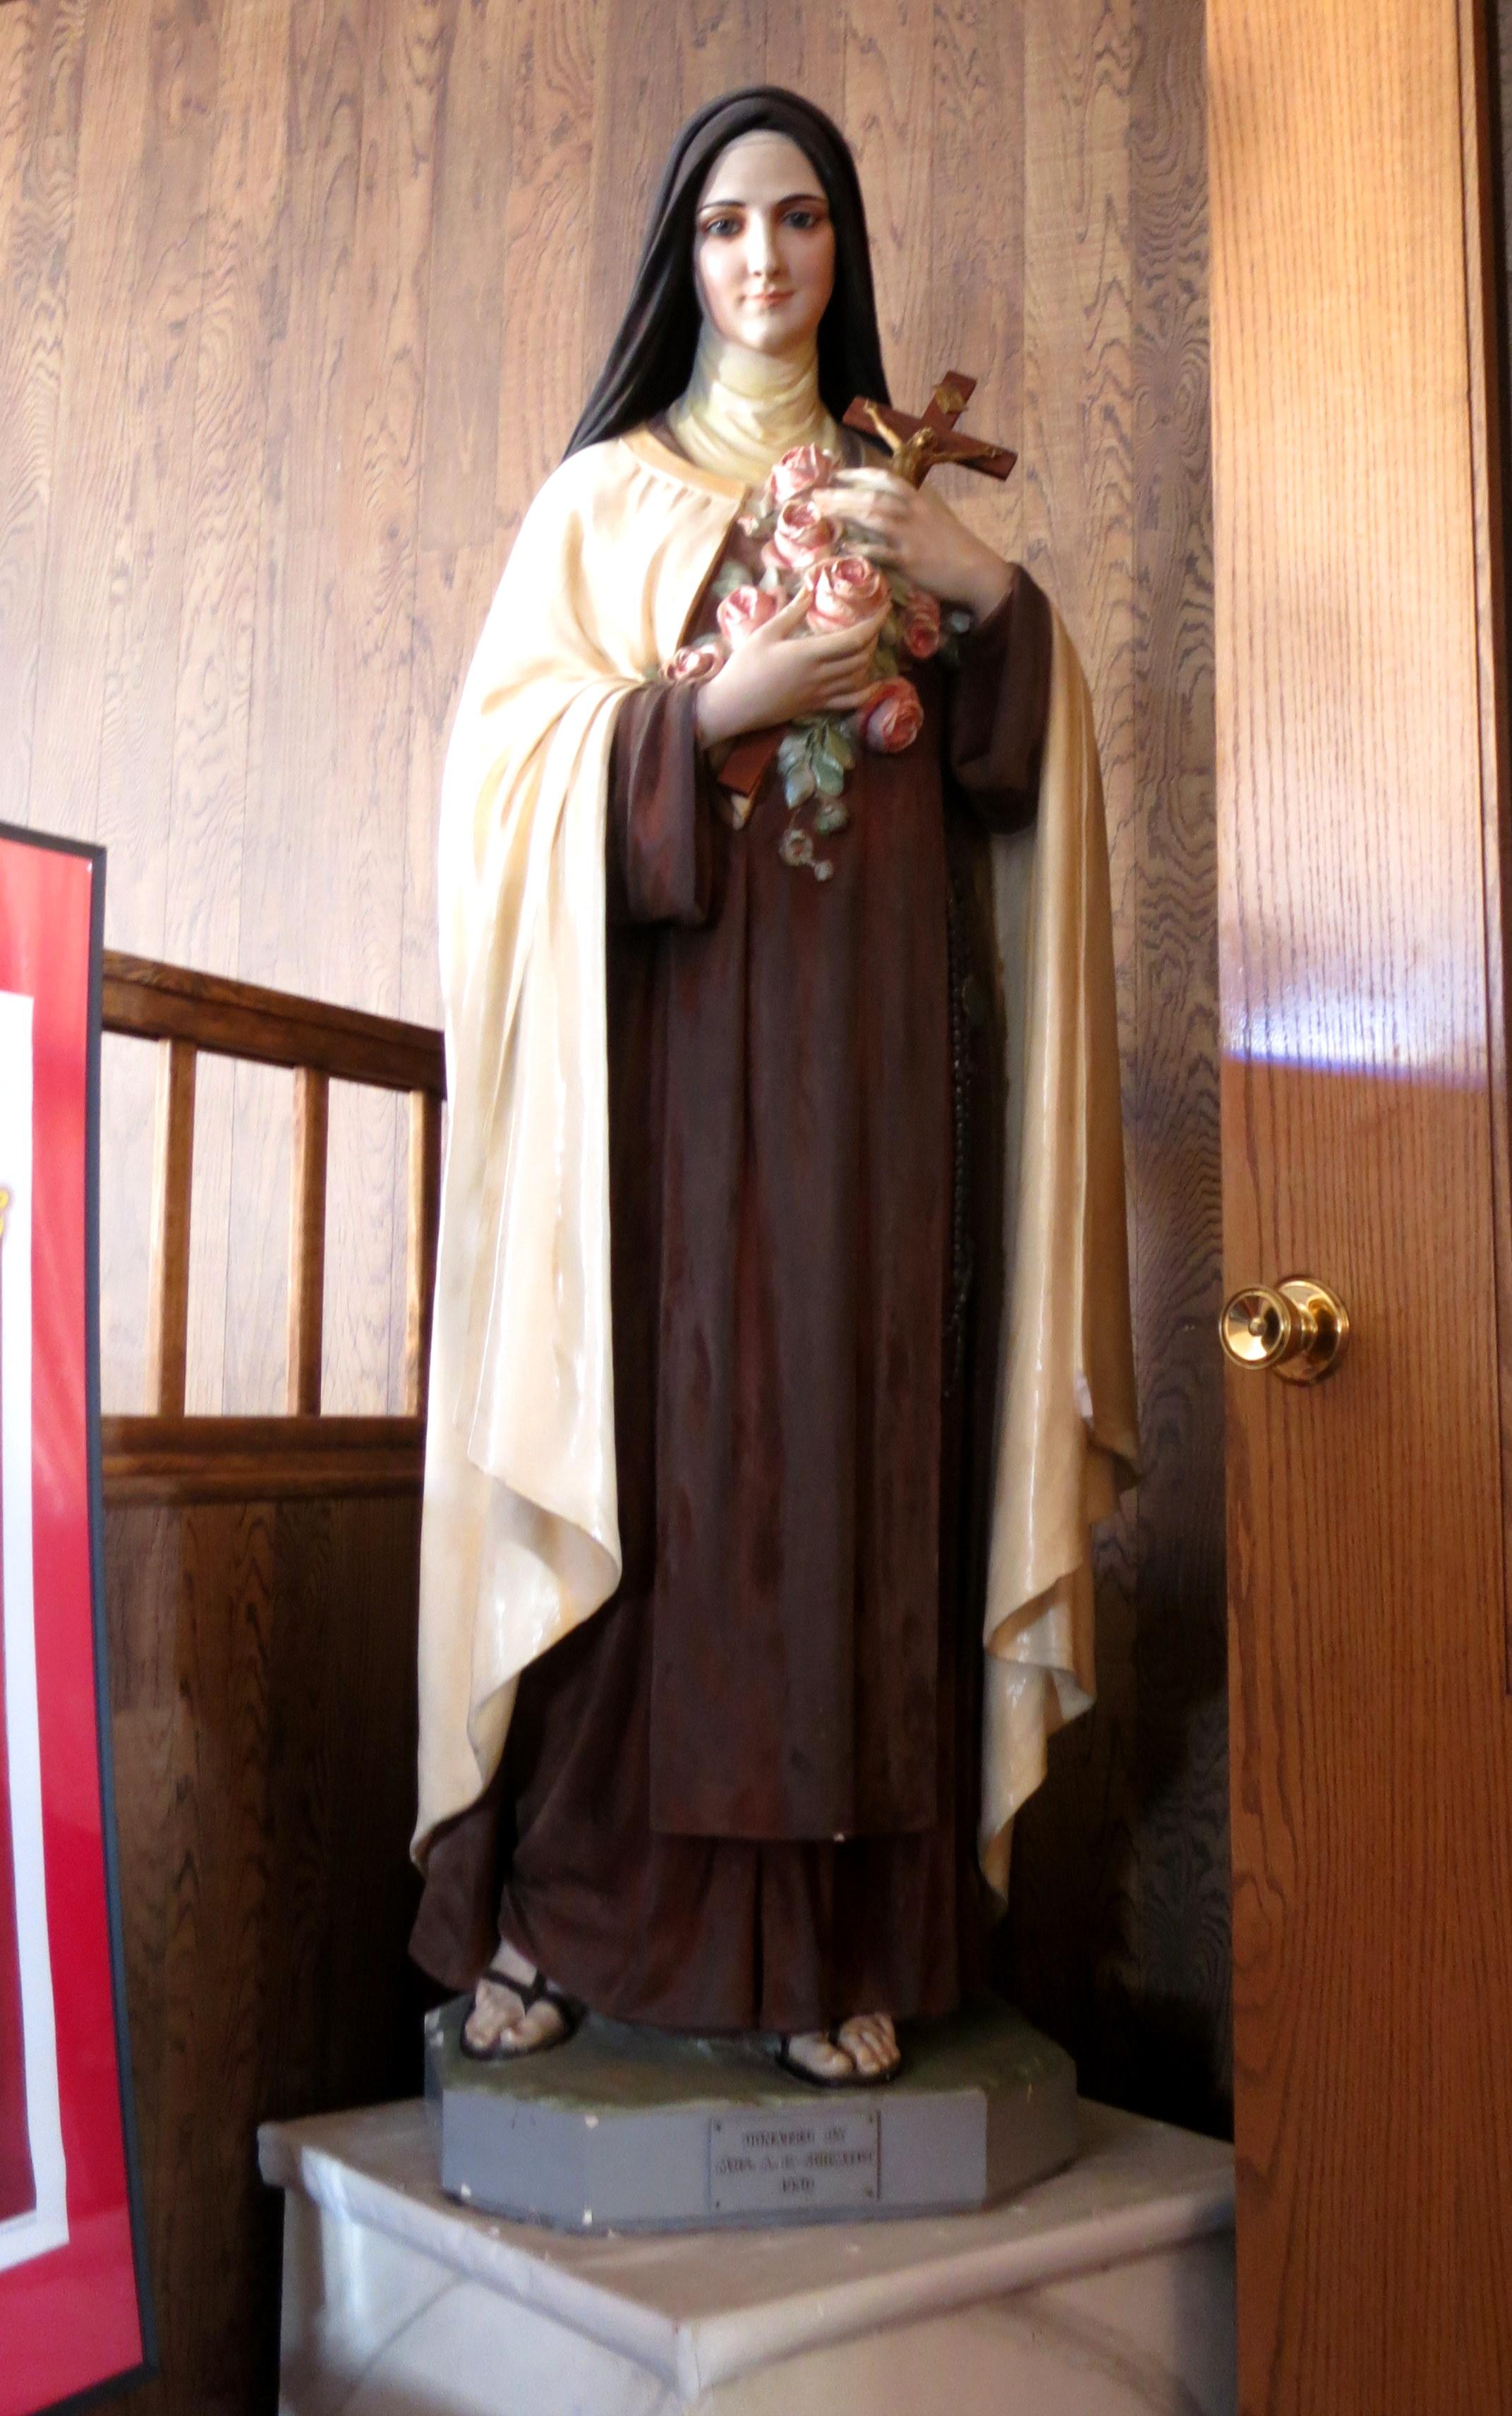 Lustblack Blond Baltimore Catholic Dating In